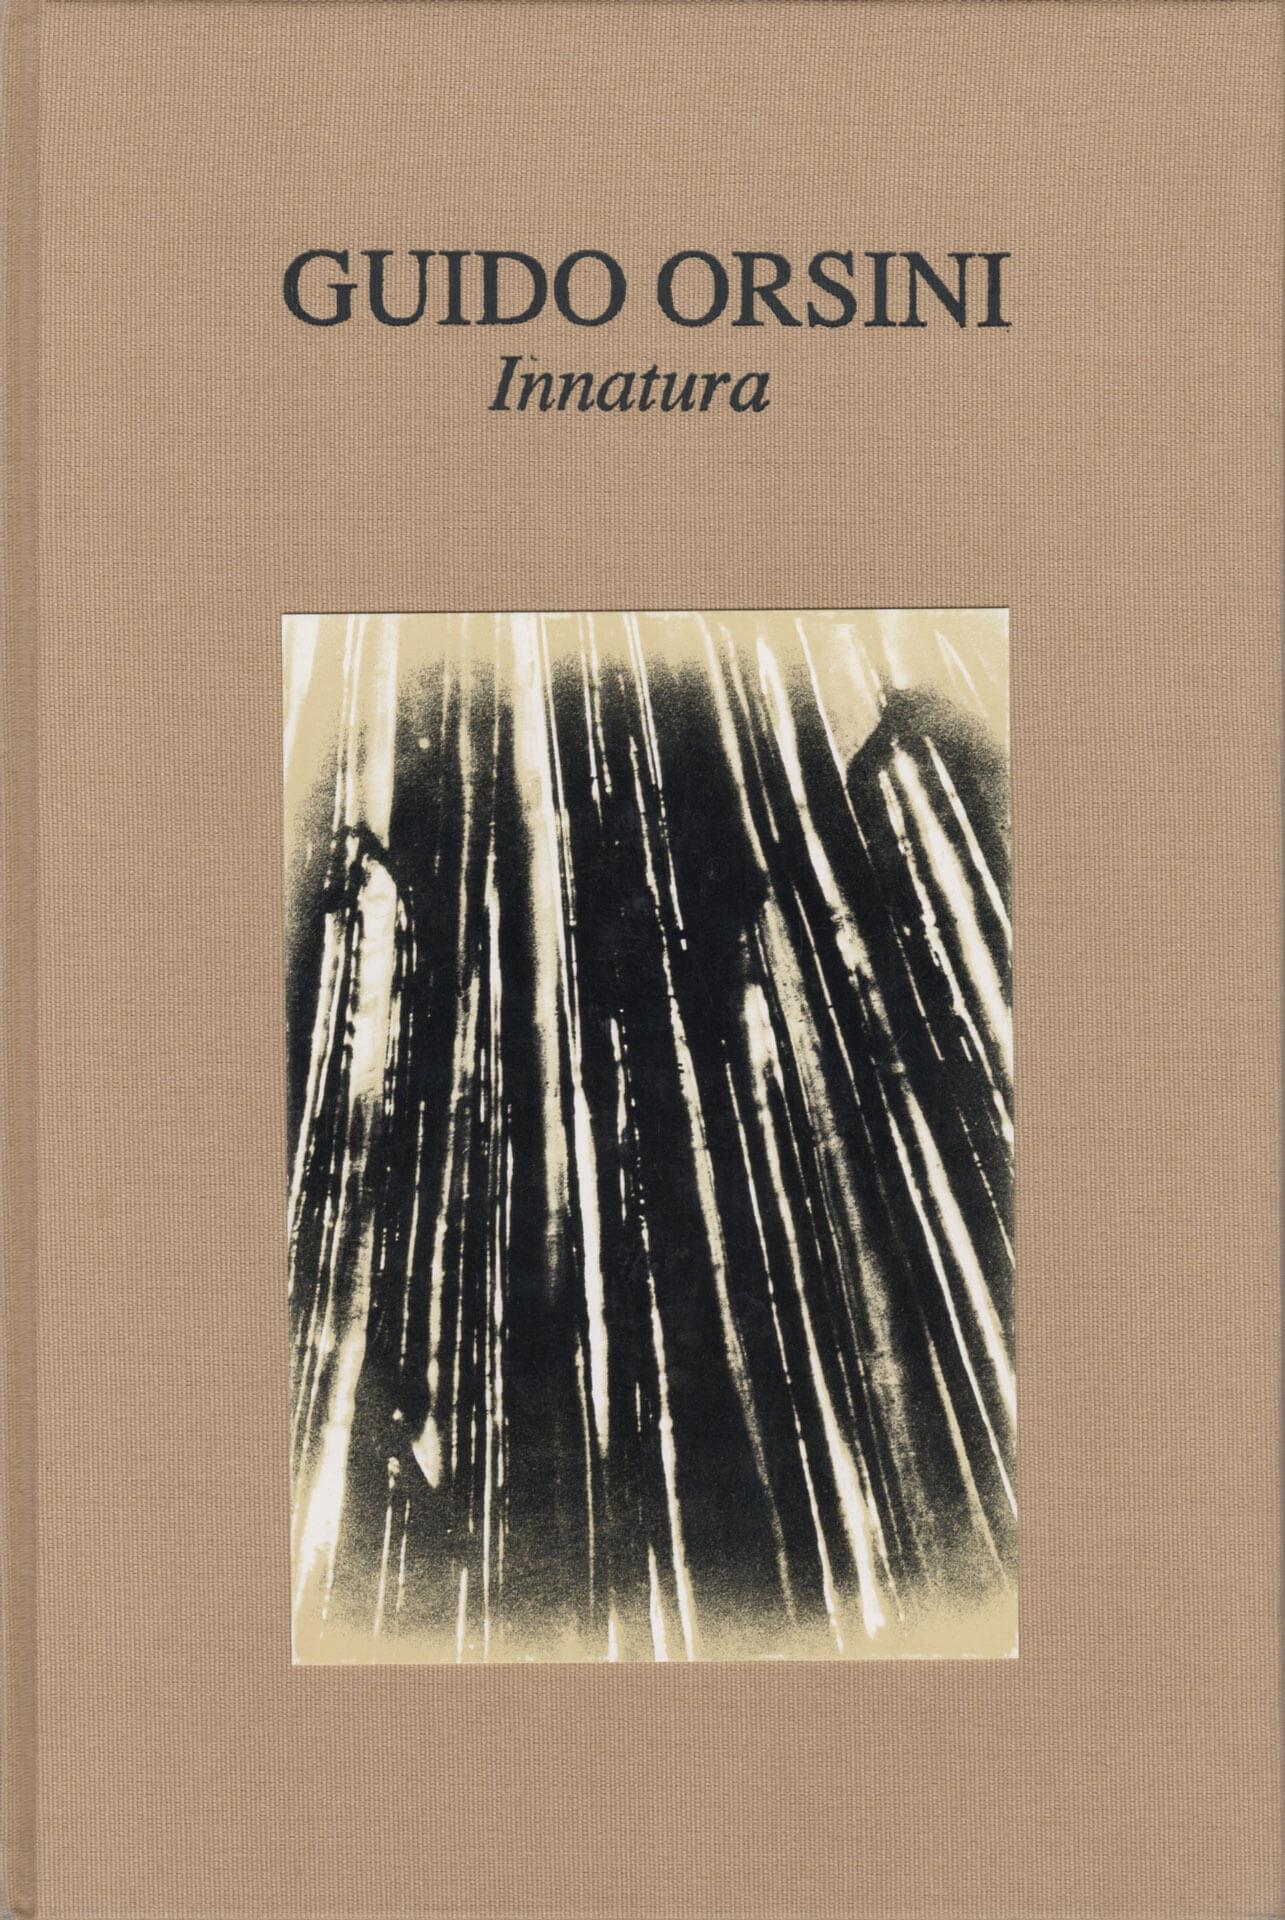 Studio Stefania Miscetti | Catalogues | Guido Orsini | Innatura